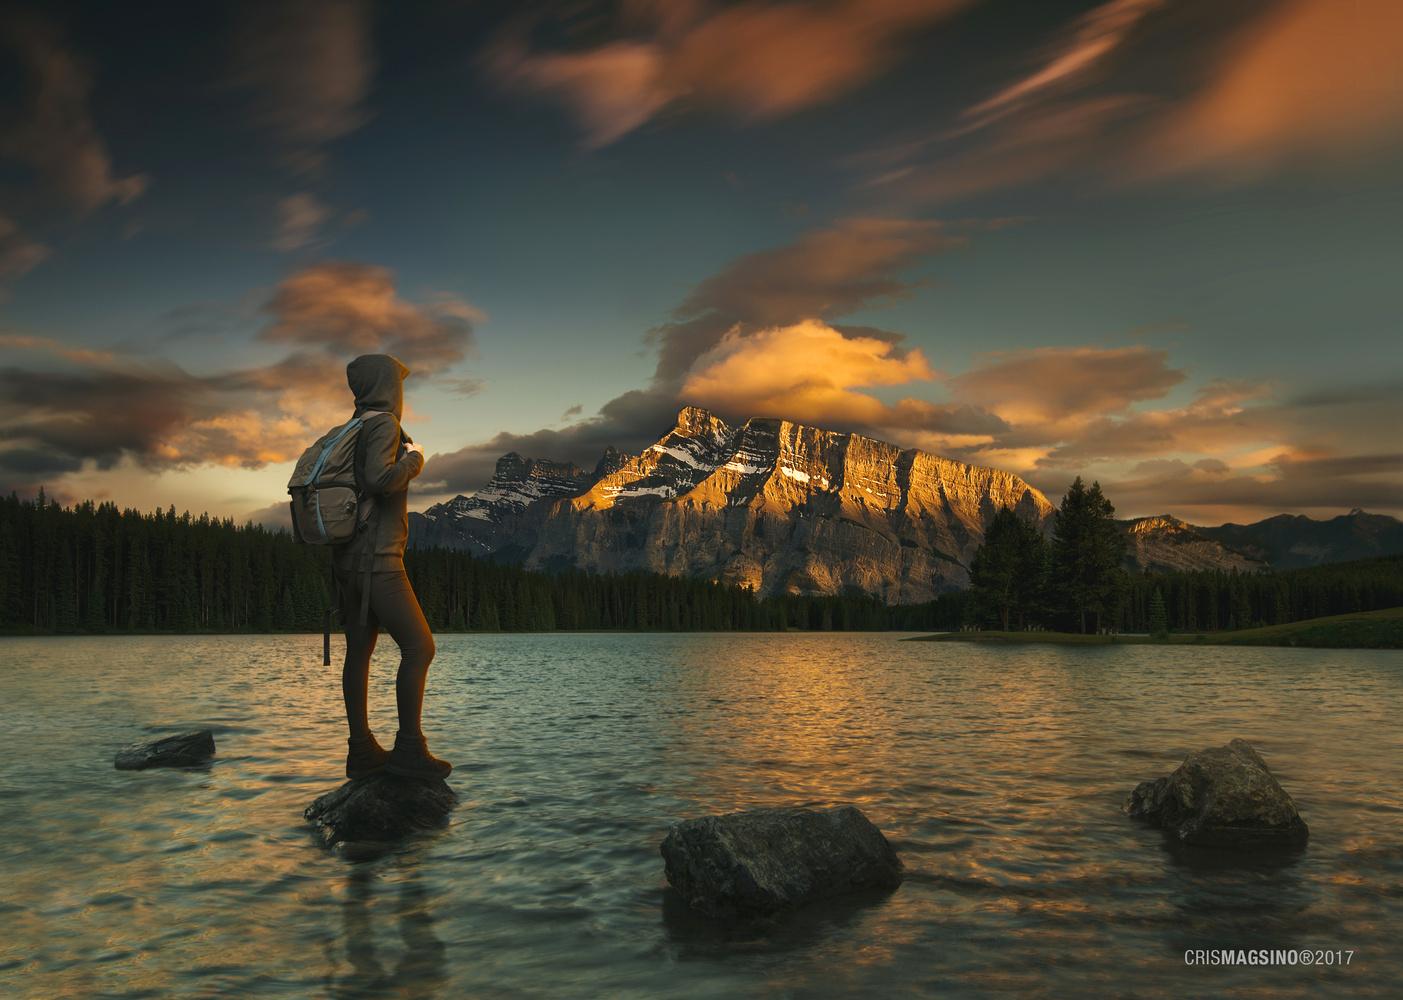 Golden Sunset by Cris Magsino